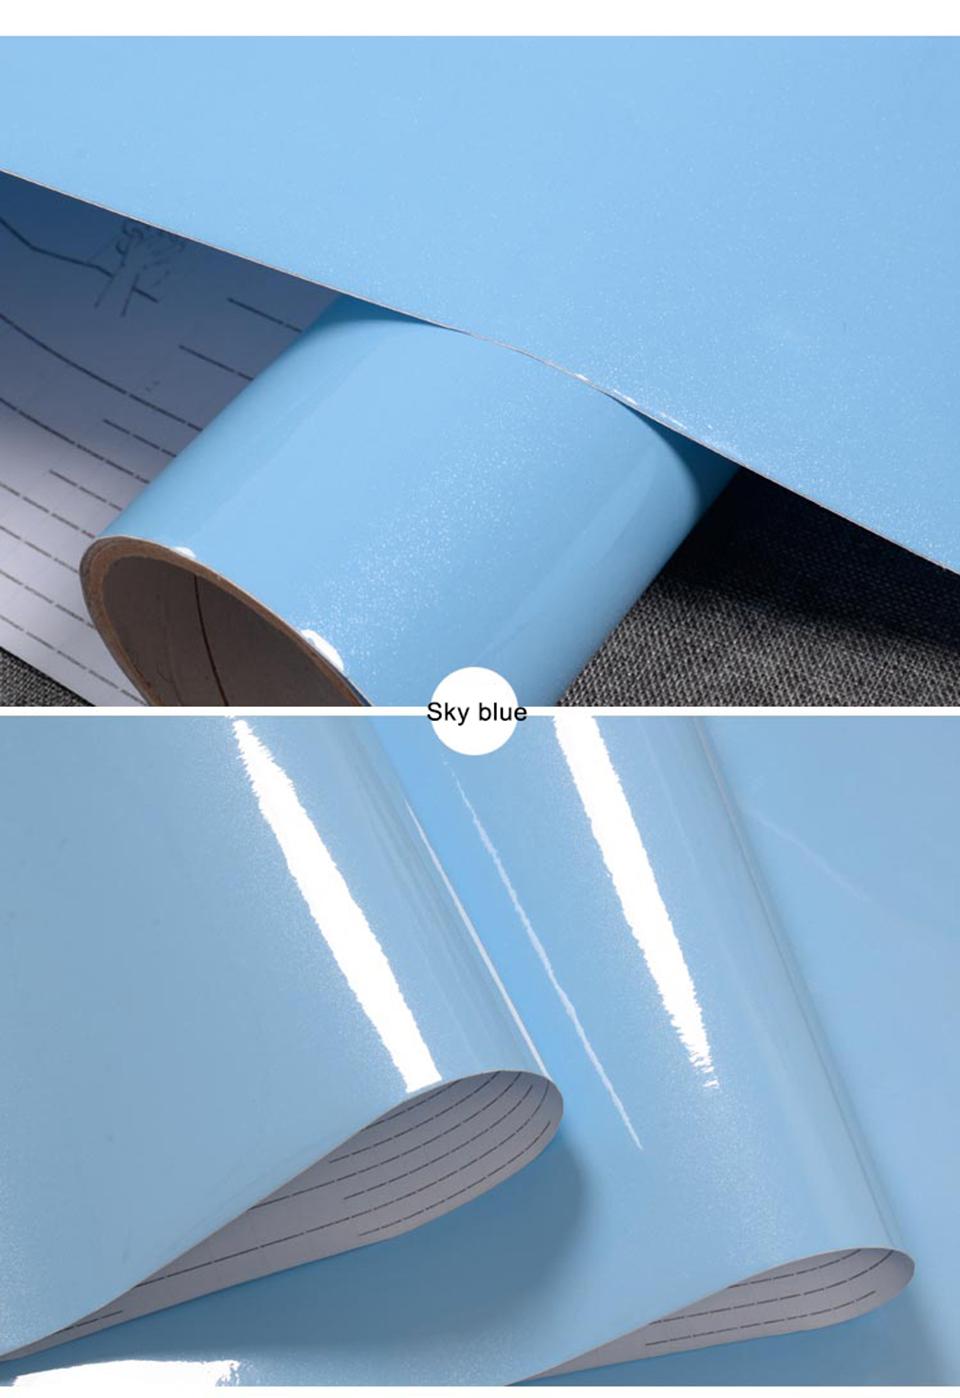 HTB1dXzKzKuSBuNjSsplq6ze8pXaz Vinyl DIY Contact Paper PVC Self adhesive Wallpaper For Kitchen